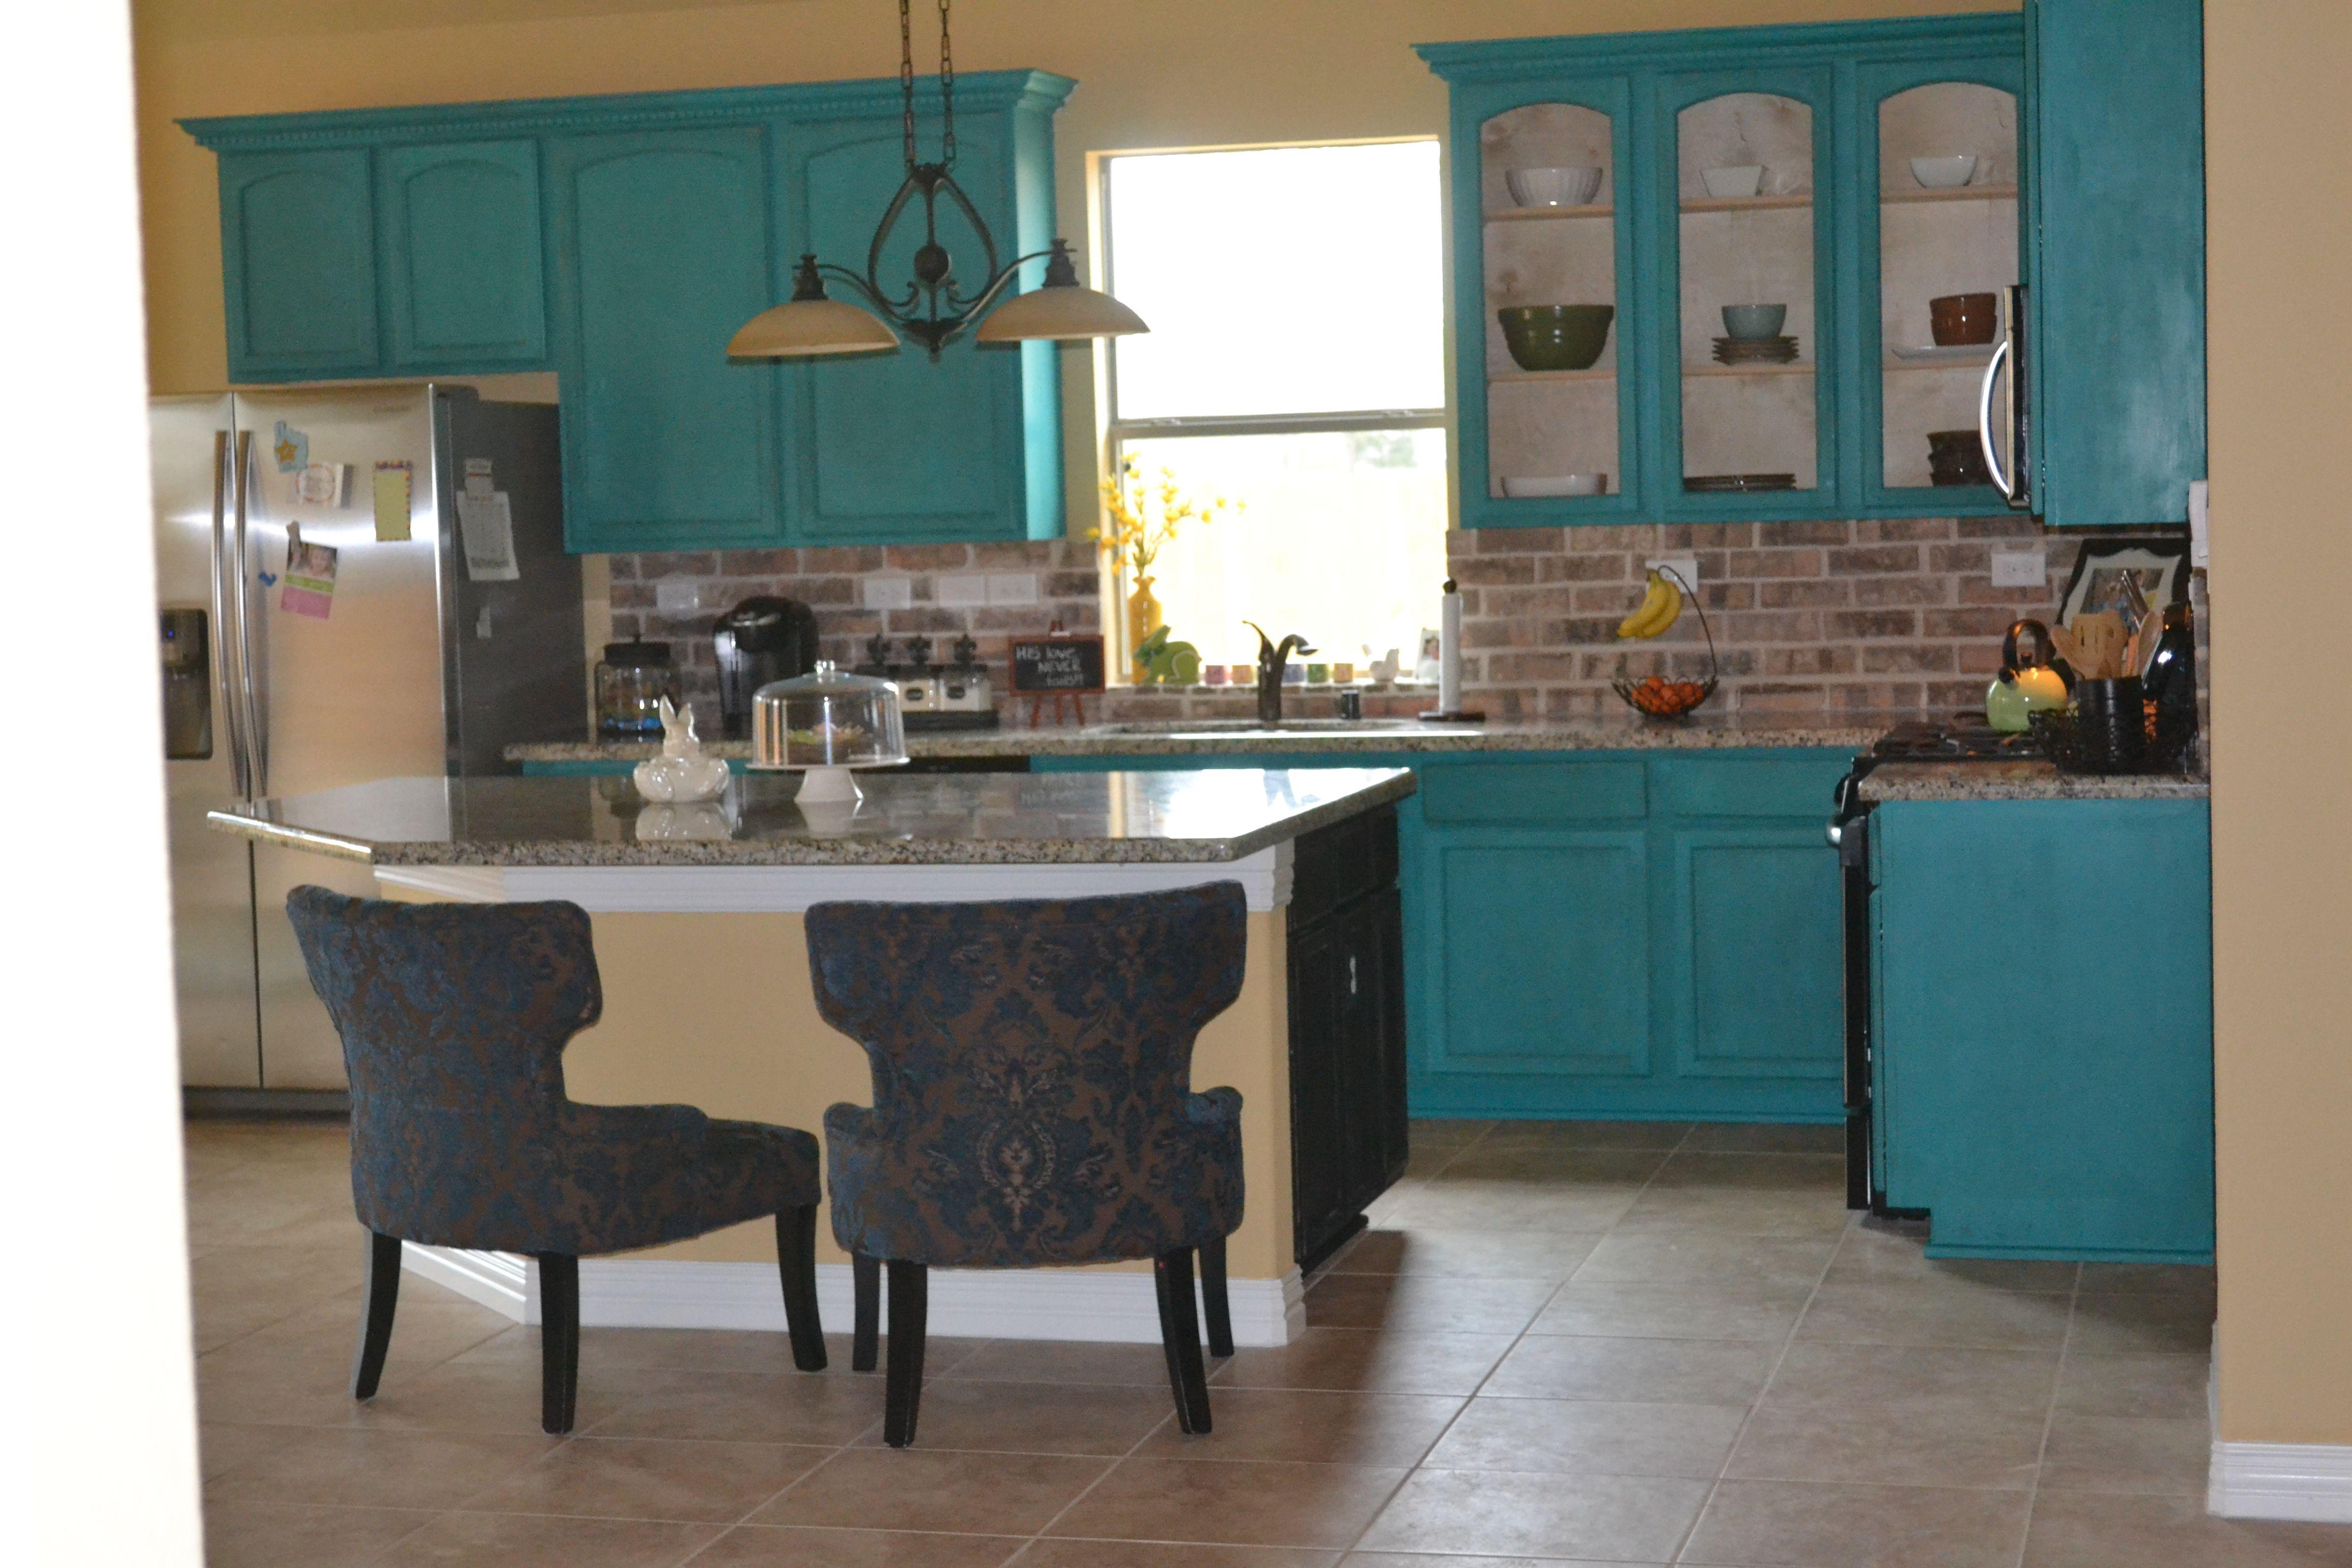 Turquoise kitchen cabinets kitchen pinterest for Kitchen ideas turquoise